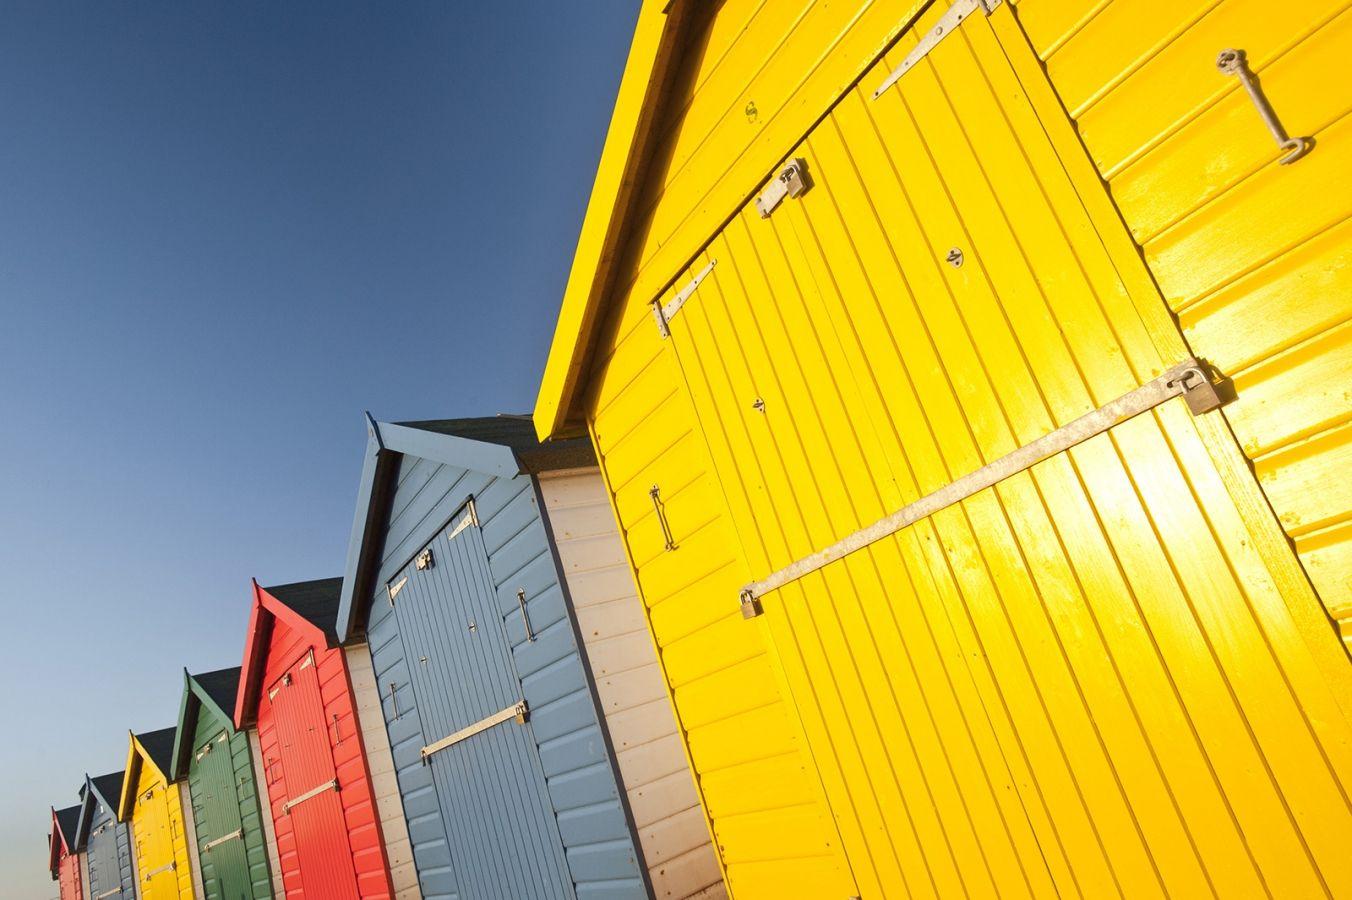 Beach_Huts-8024